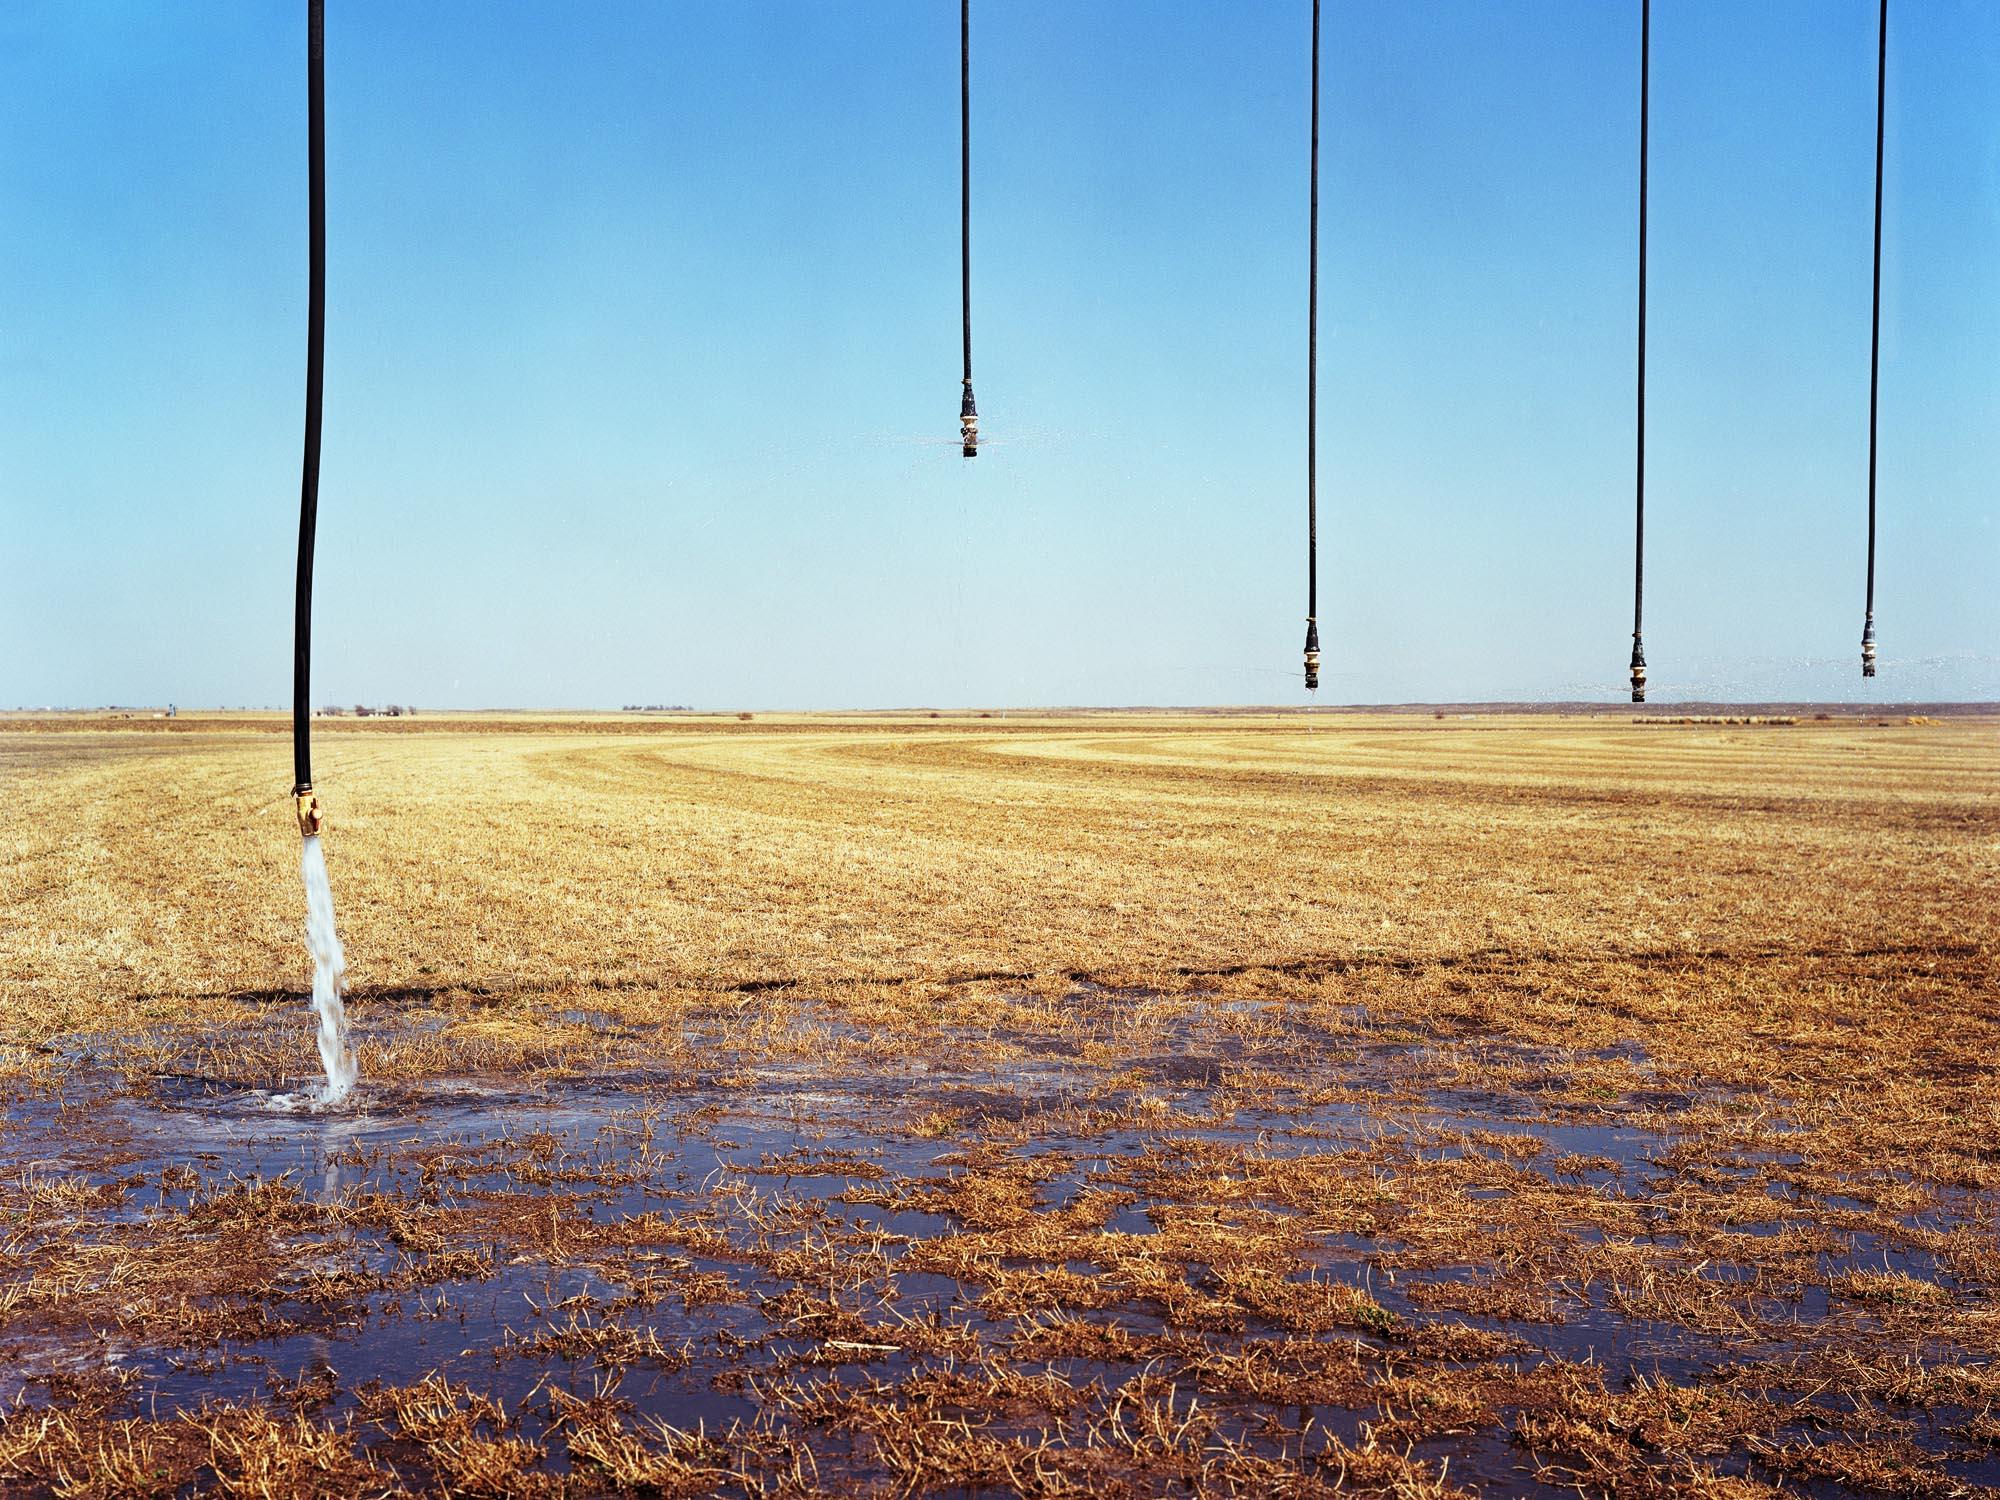 Lust_Dianna_Pivot Irrigation.jpg